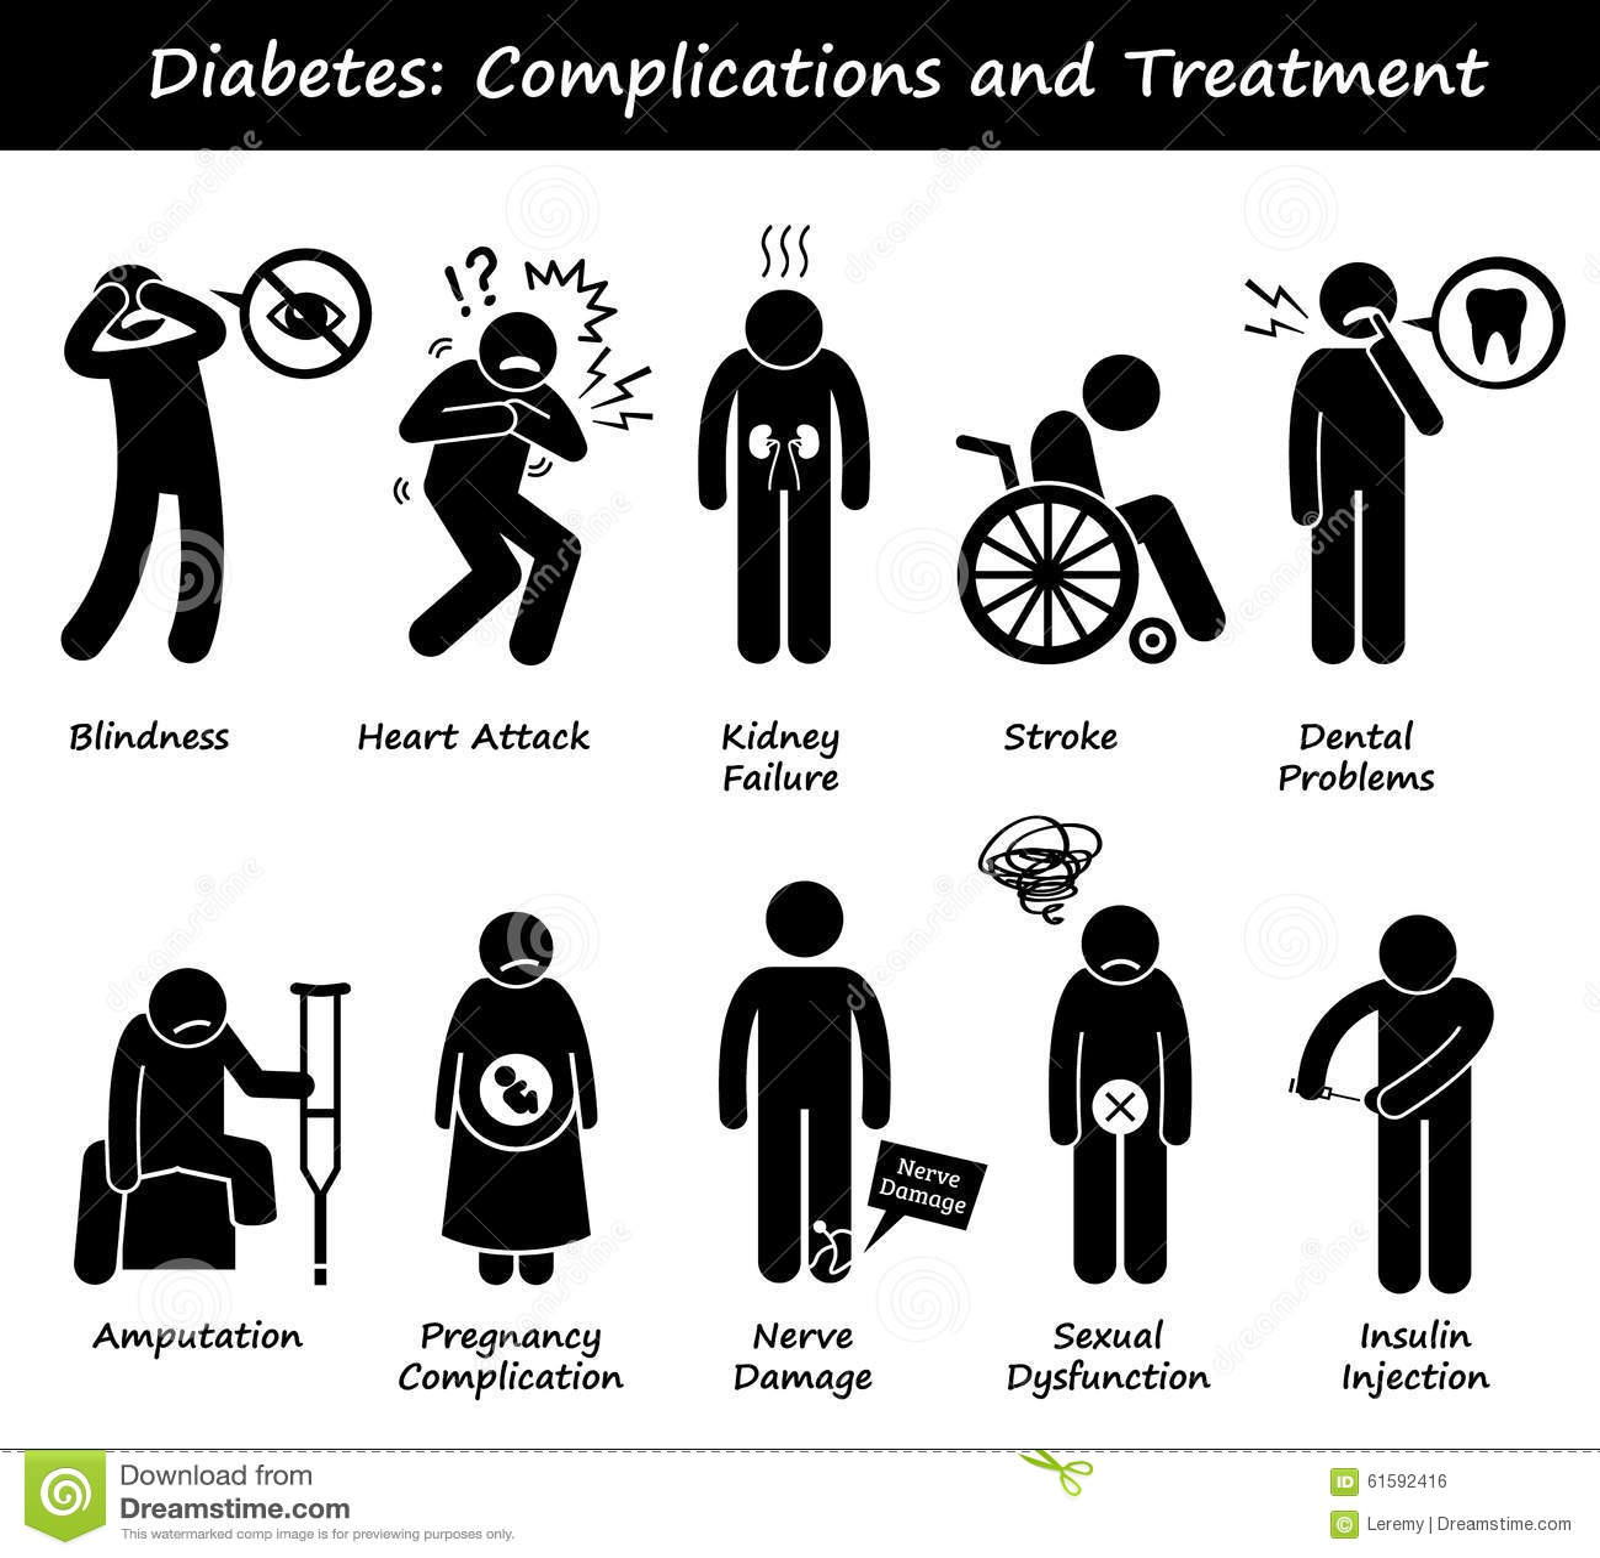 diabetes mellitus diabetic complications and treatment clipart stock rh dreamstime com Diabetes Complications Clip Art Diabetes Education